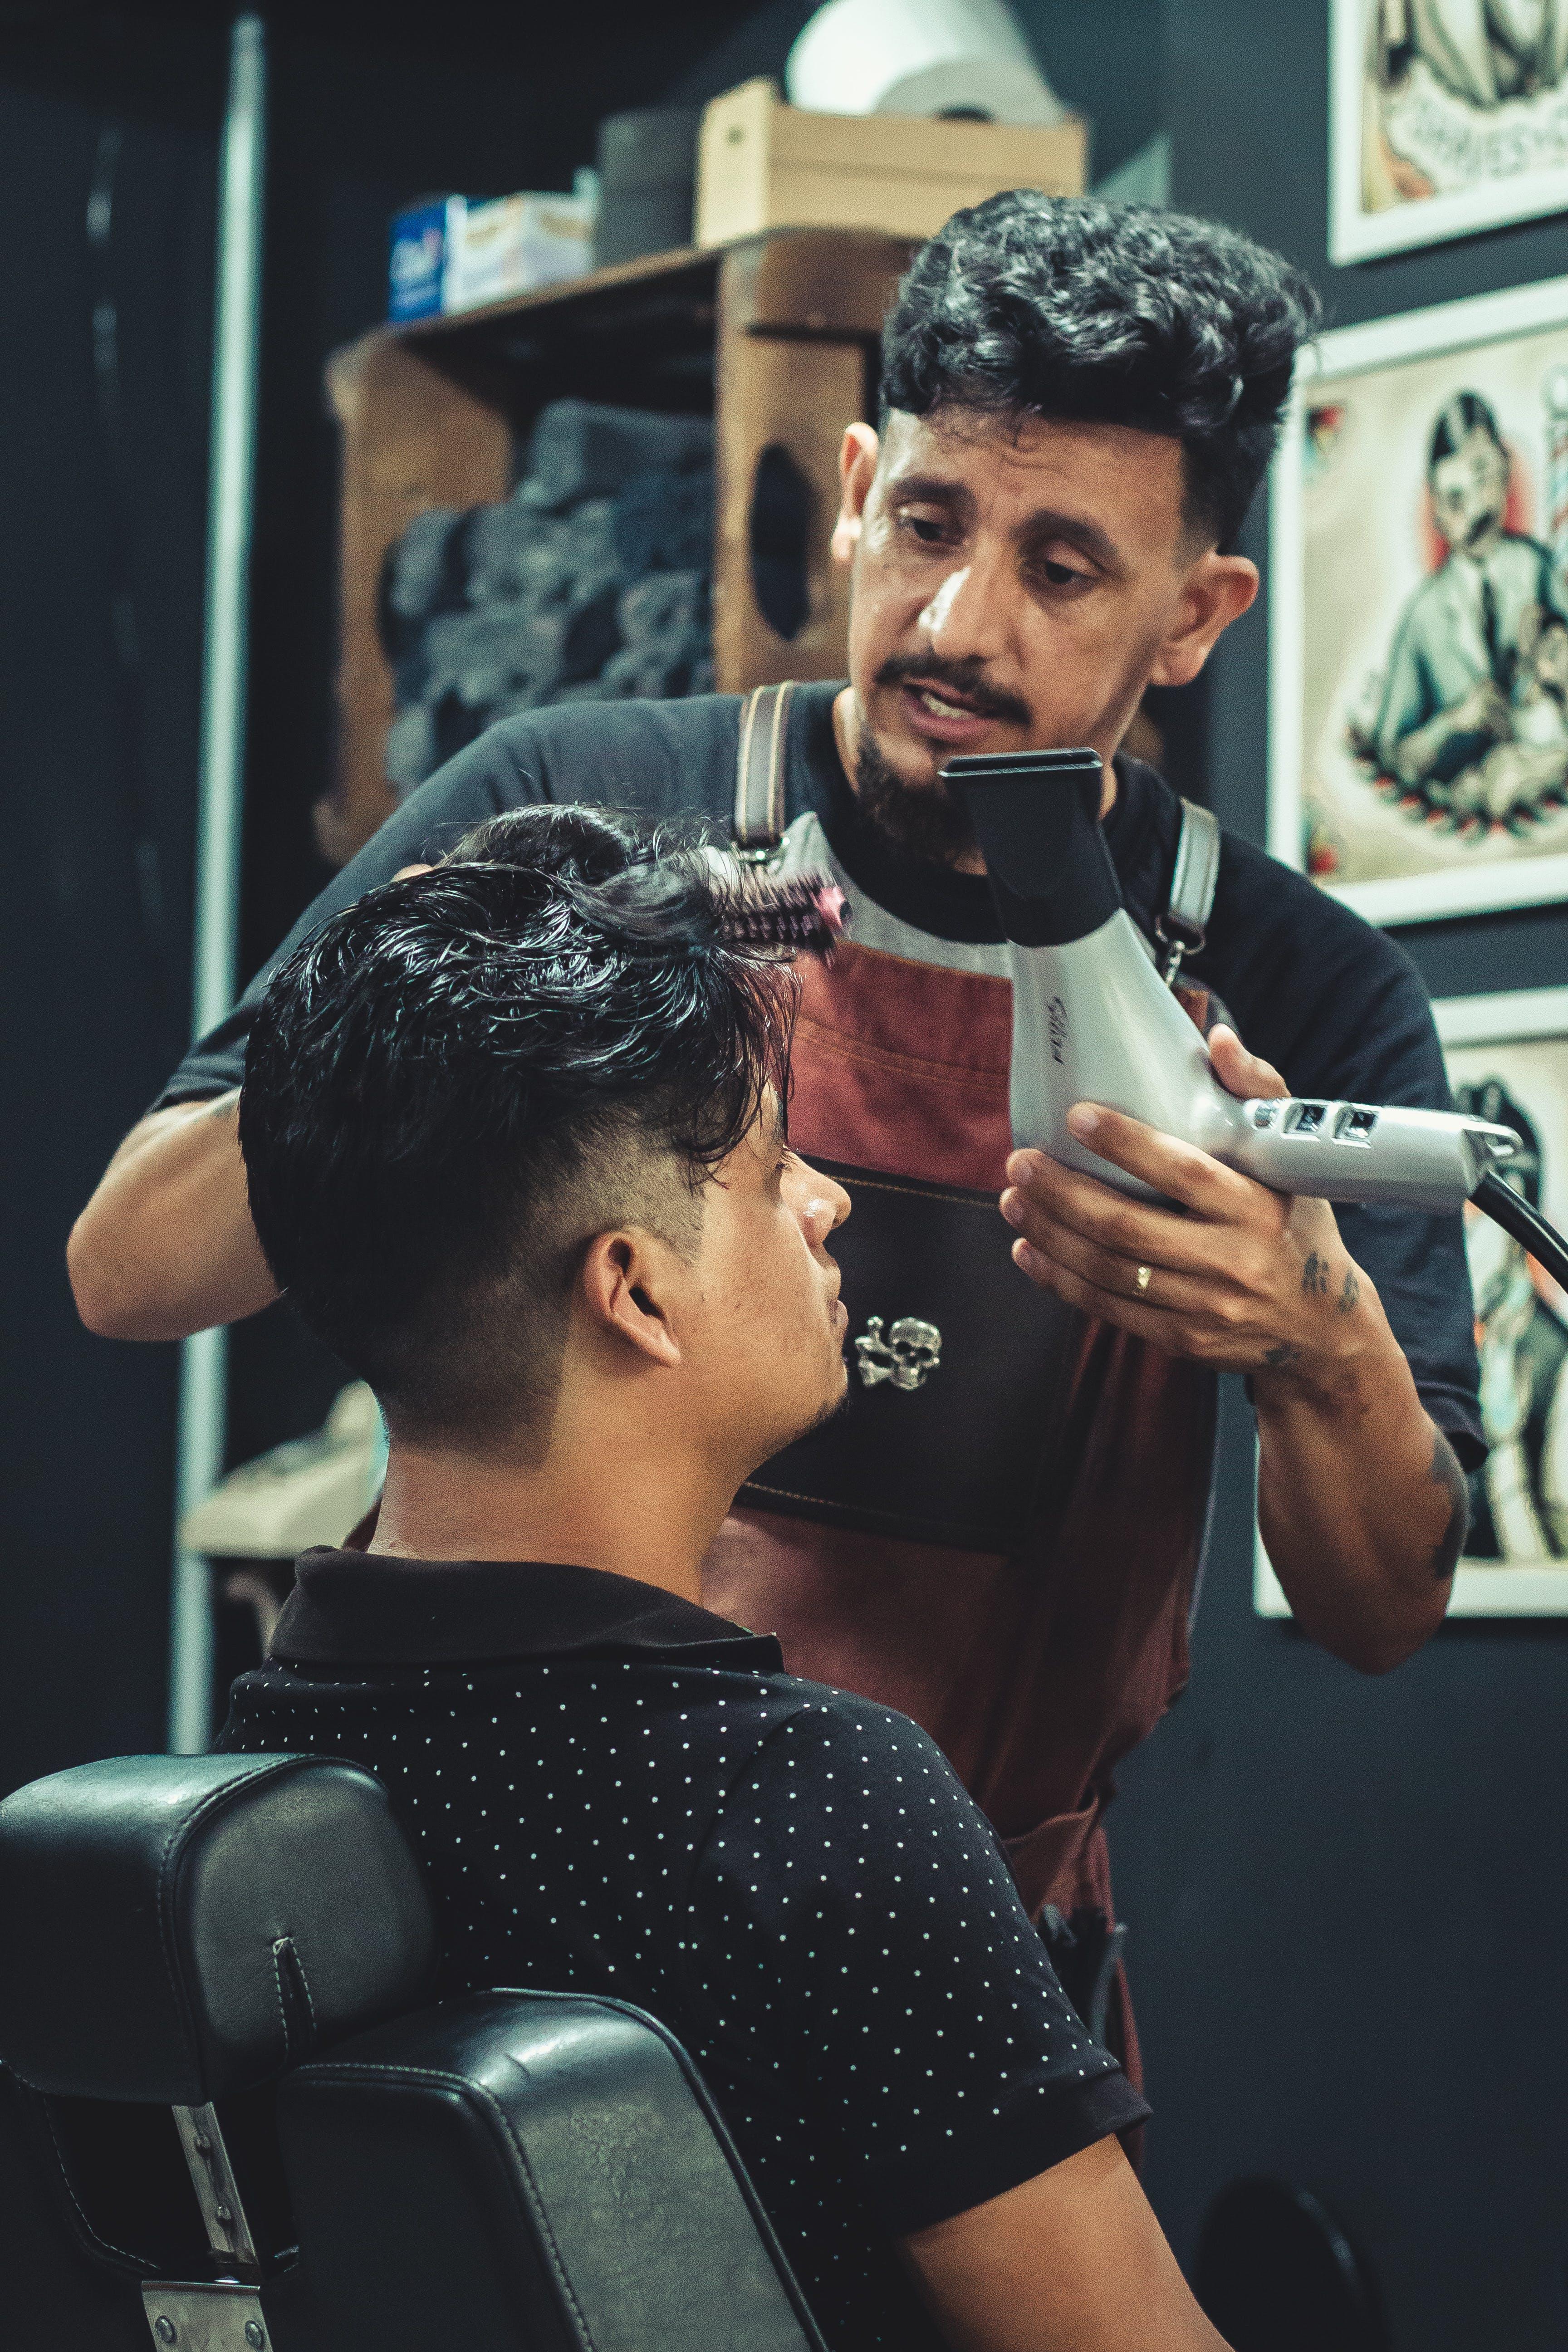 Photos gratuites de barbier, coiffant, coiffeur, coiffure